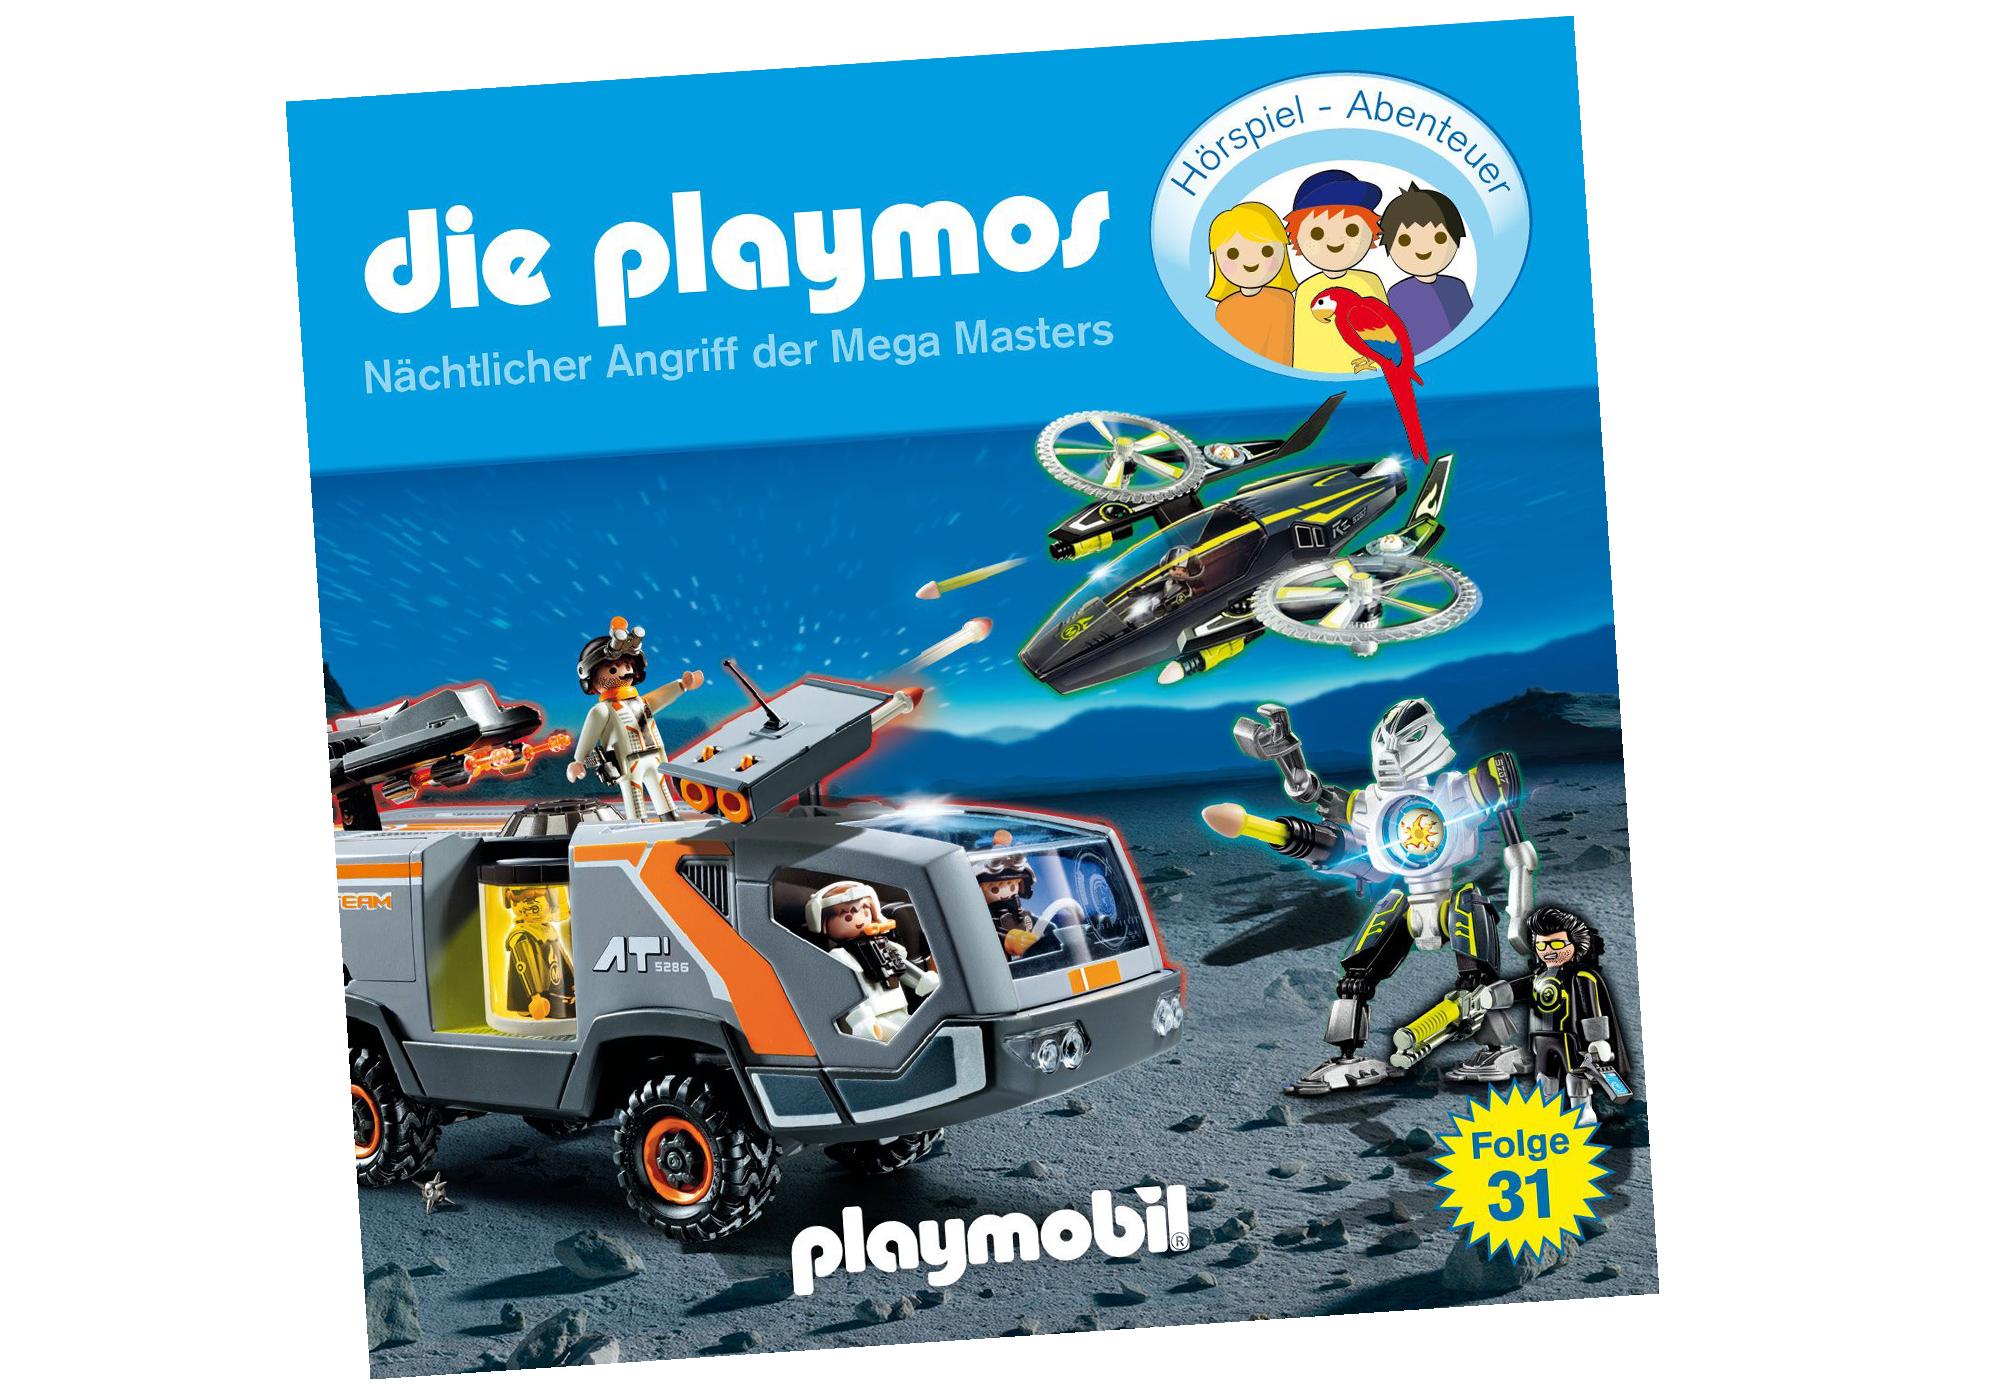 http://media.playmobil.com/i/playmobil/80350_product_detail